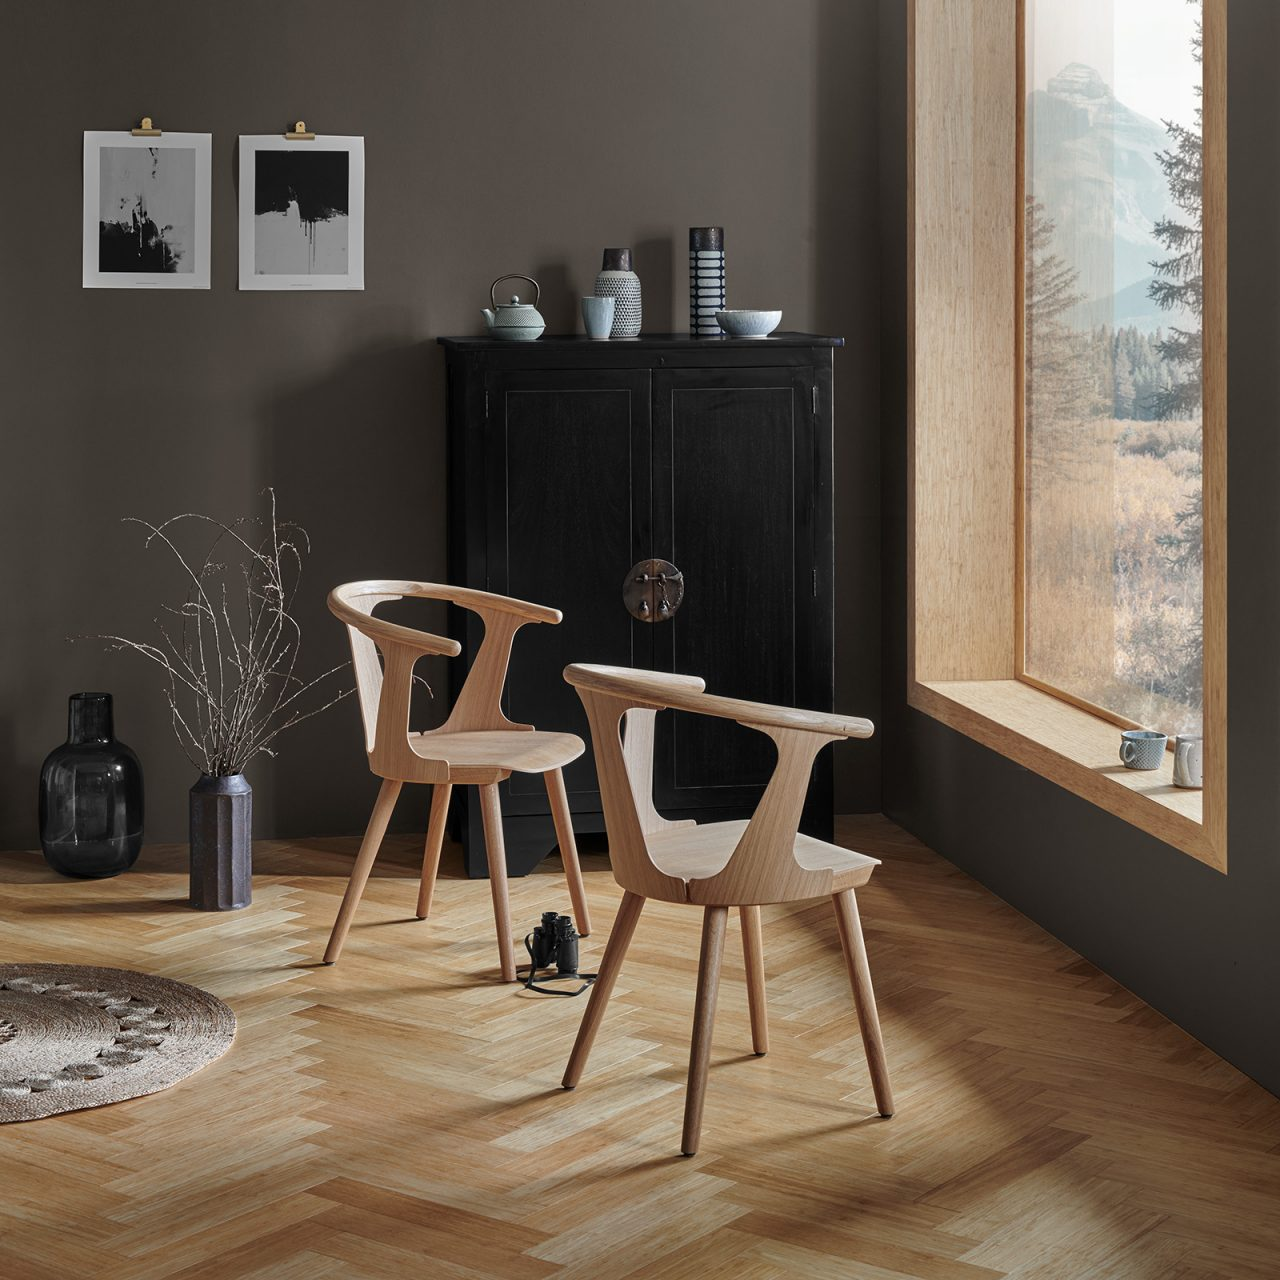 Bamboo herringbone flooring